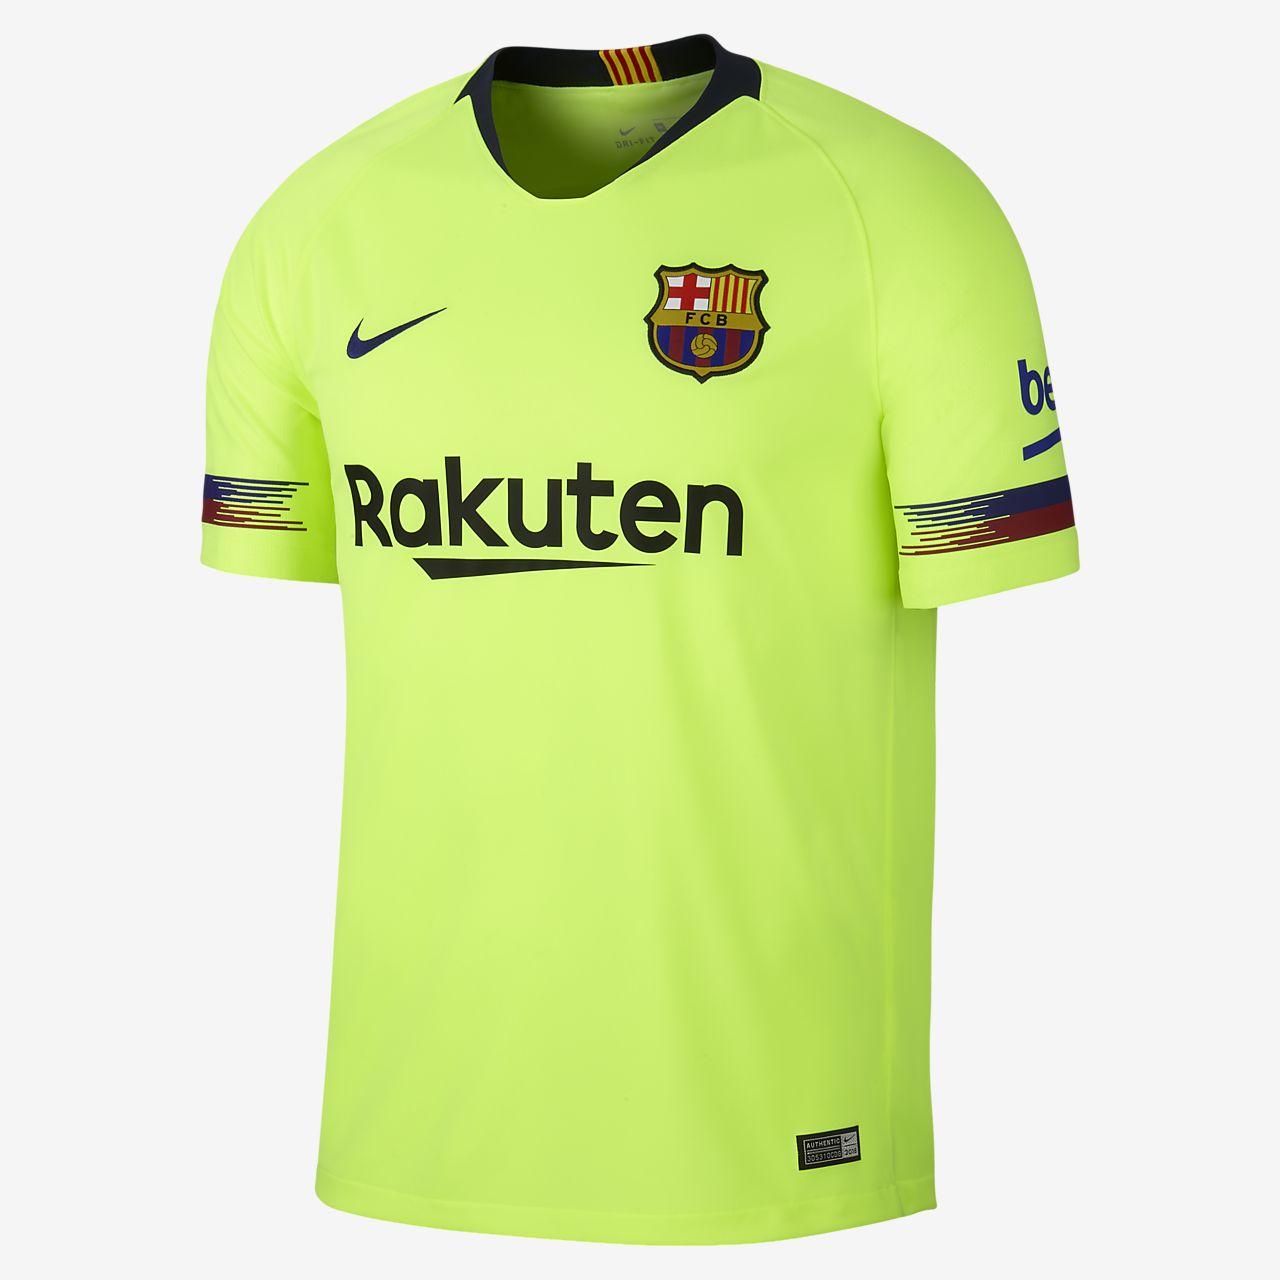 Camiseta Fútbol Fc Para Del De Hombre Visitante Barcelona Stadium rP5rqA